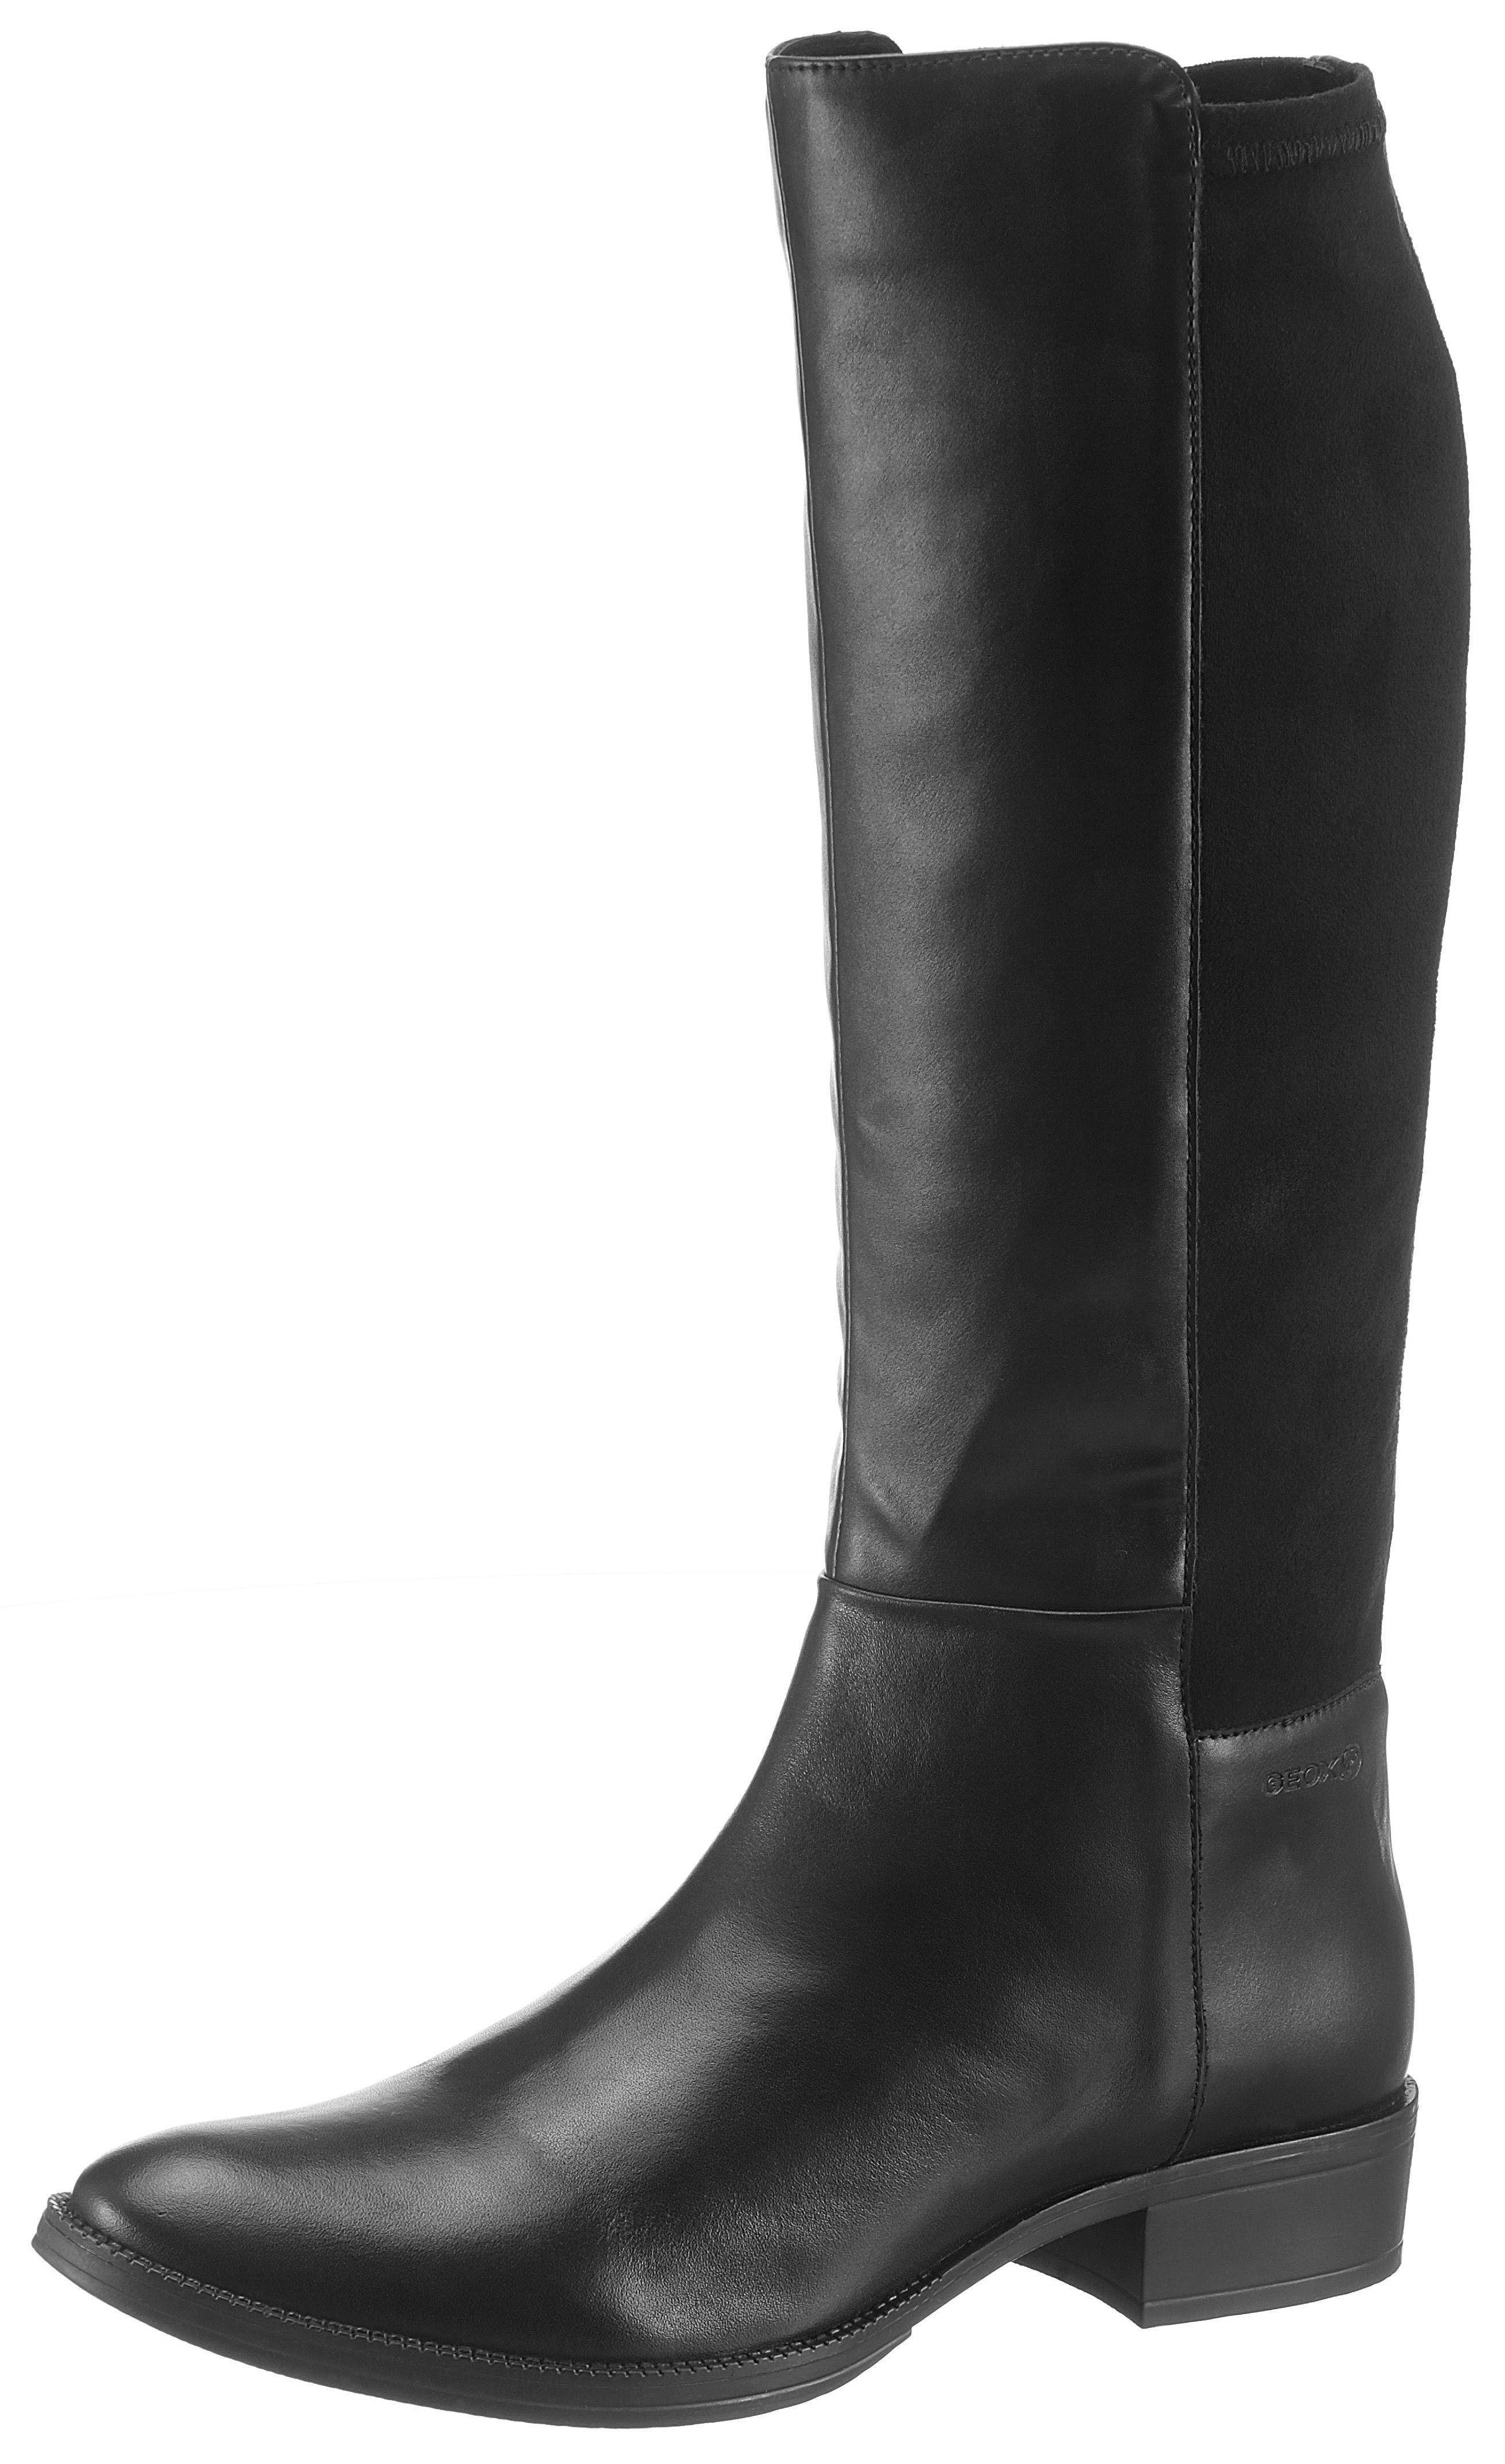 OTTO #GEOX #Sale #Schuhe #Stiefel #Damen #Geox #Stiefel